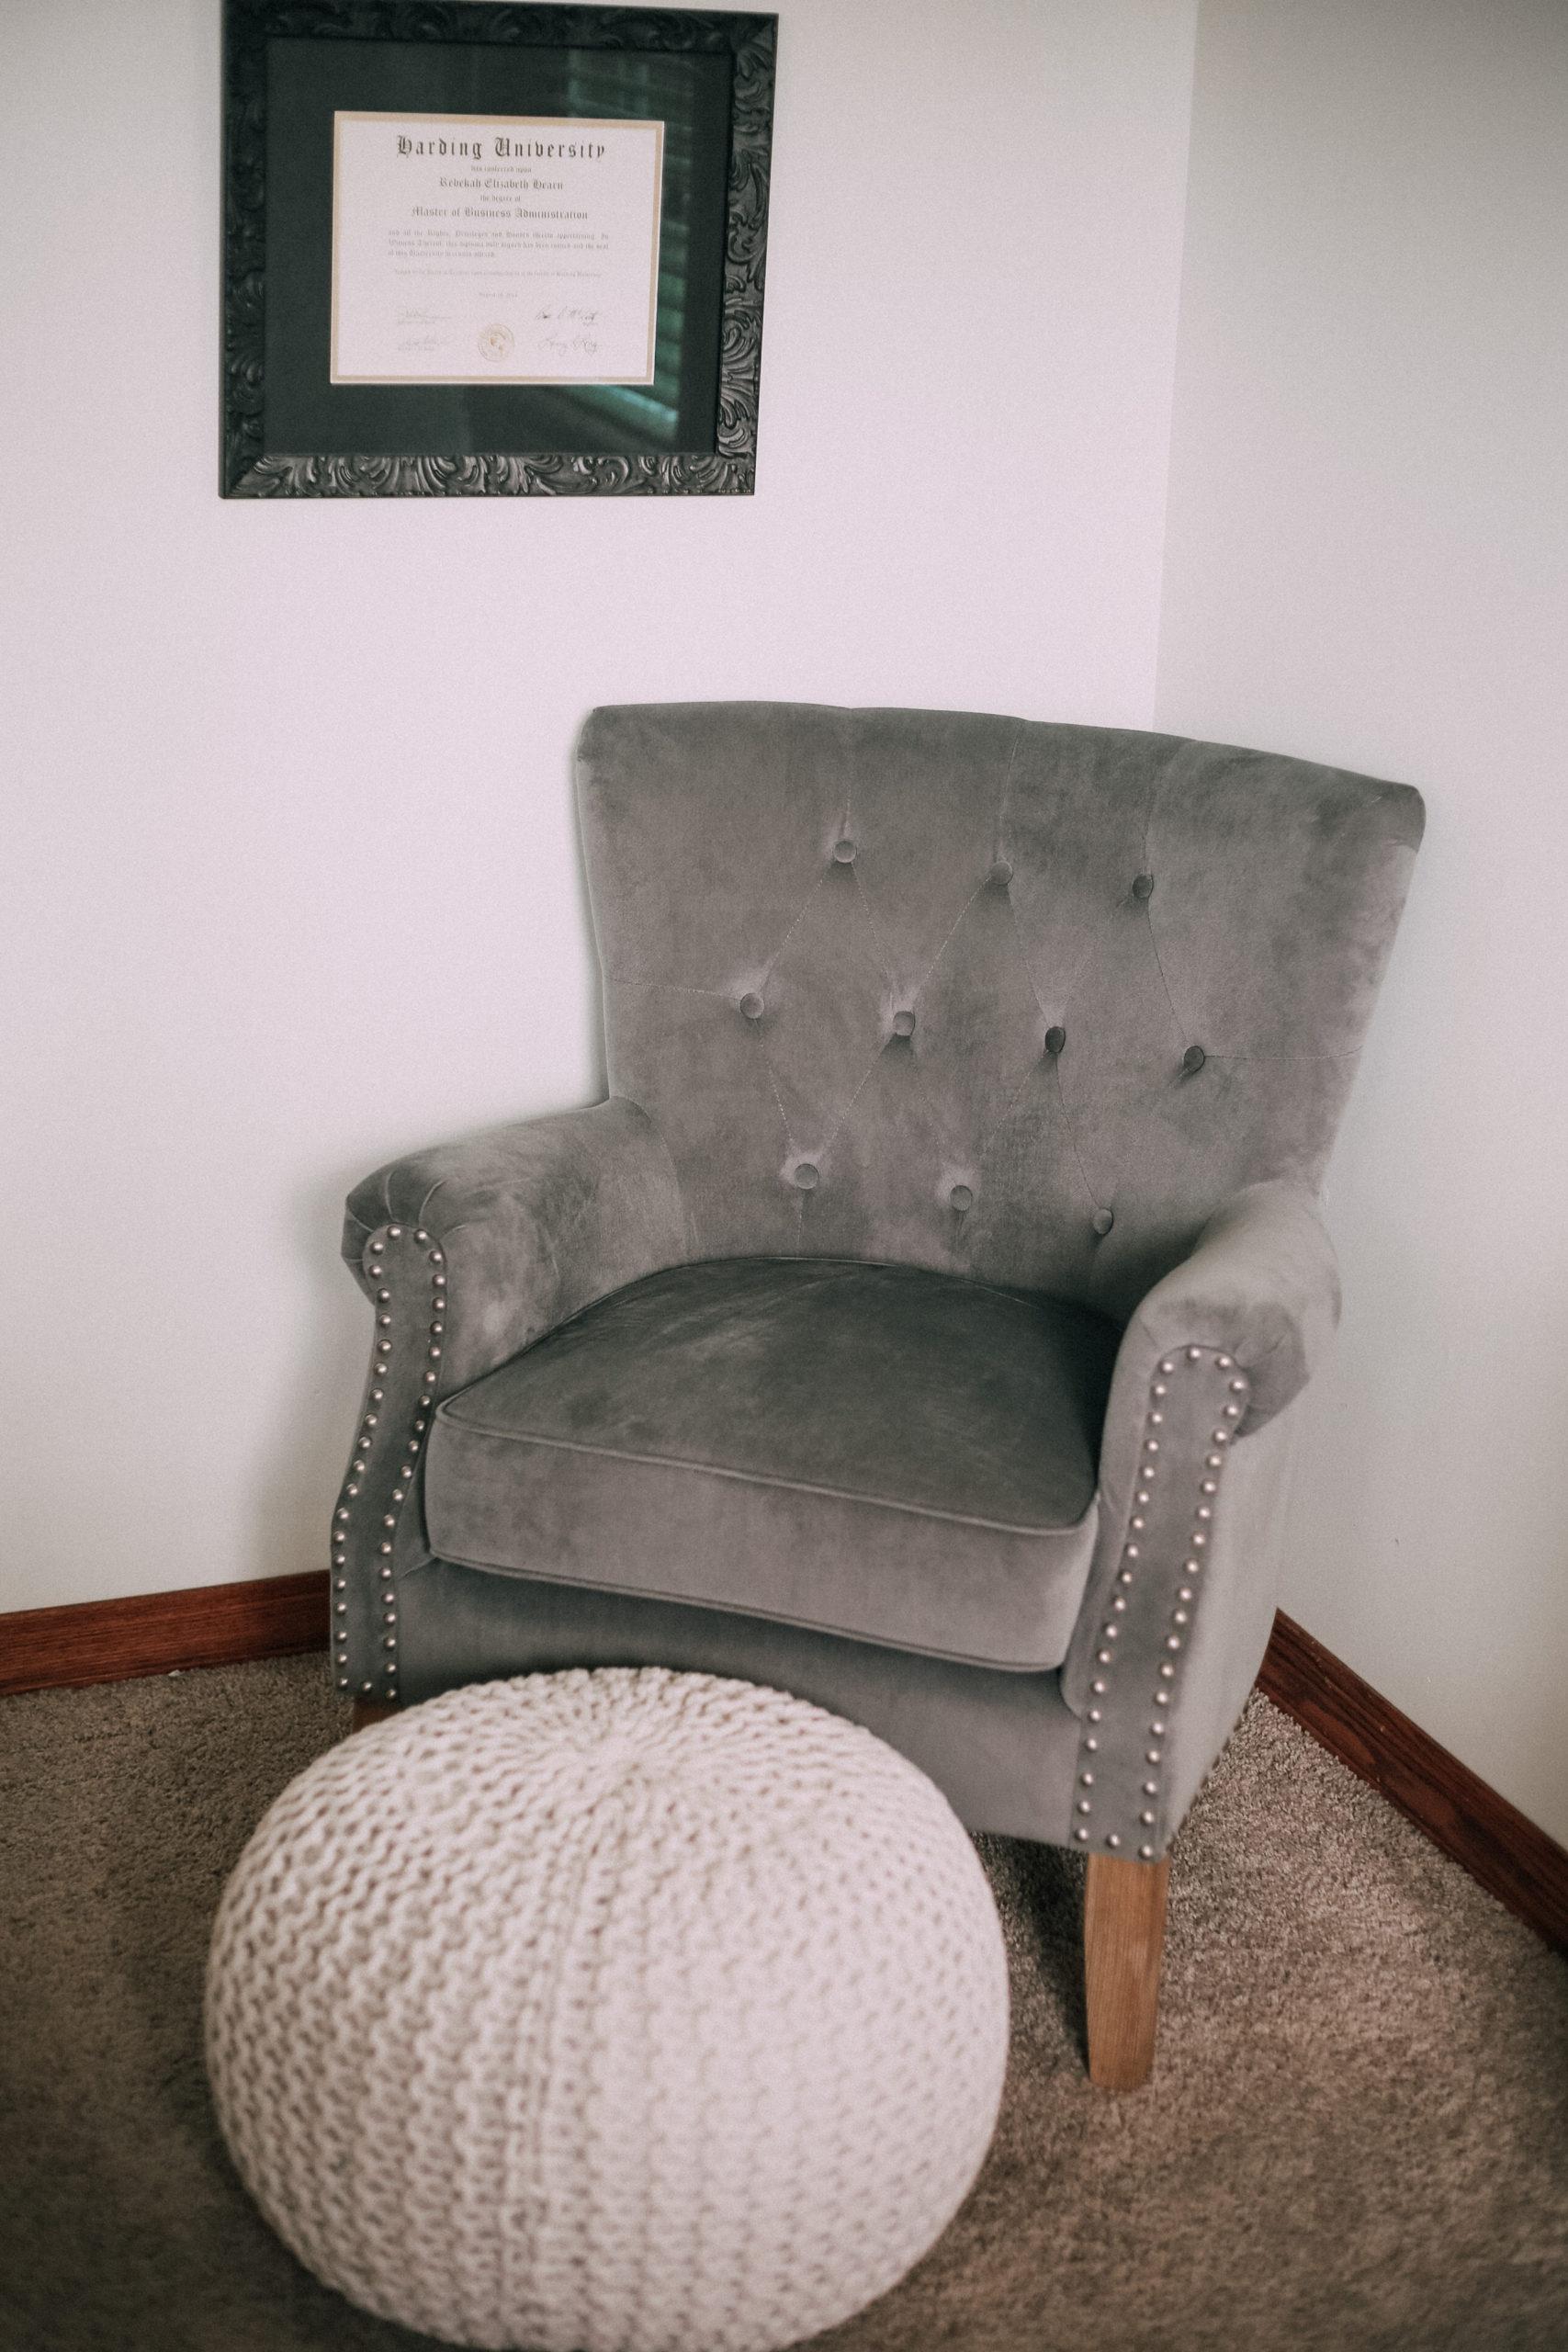 affordable bedroom decor, Walmart, white bedding